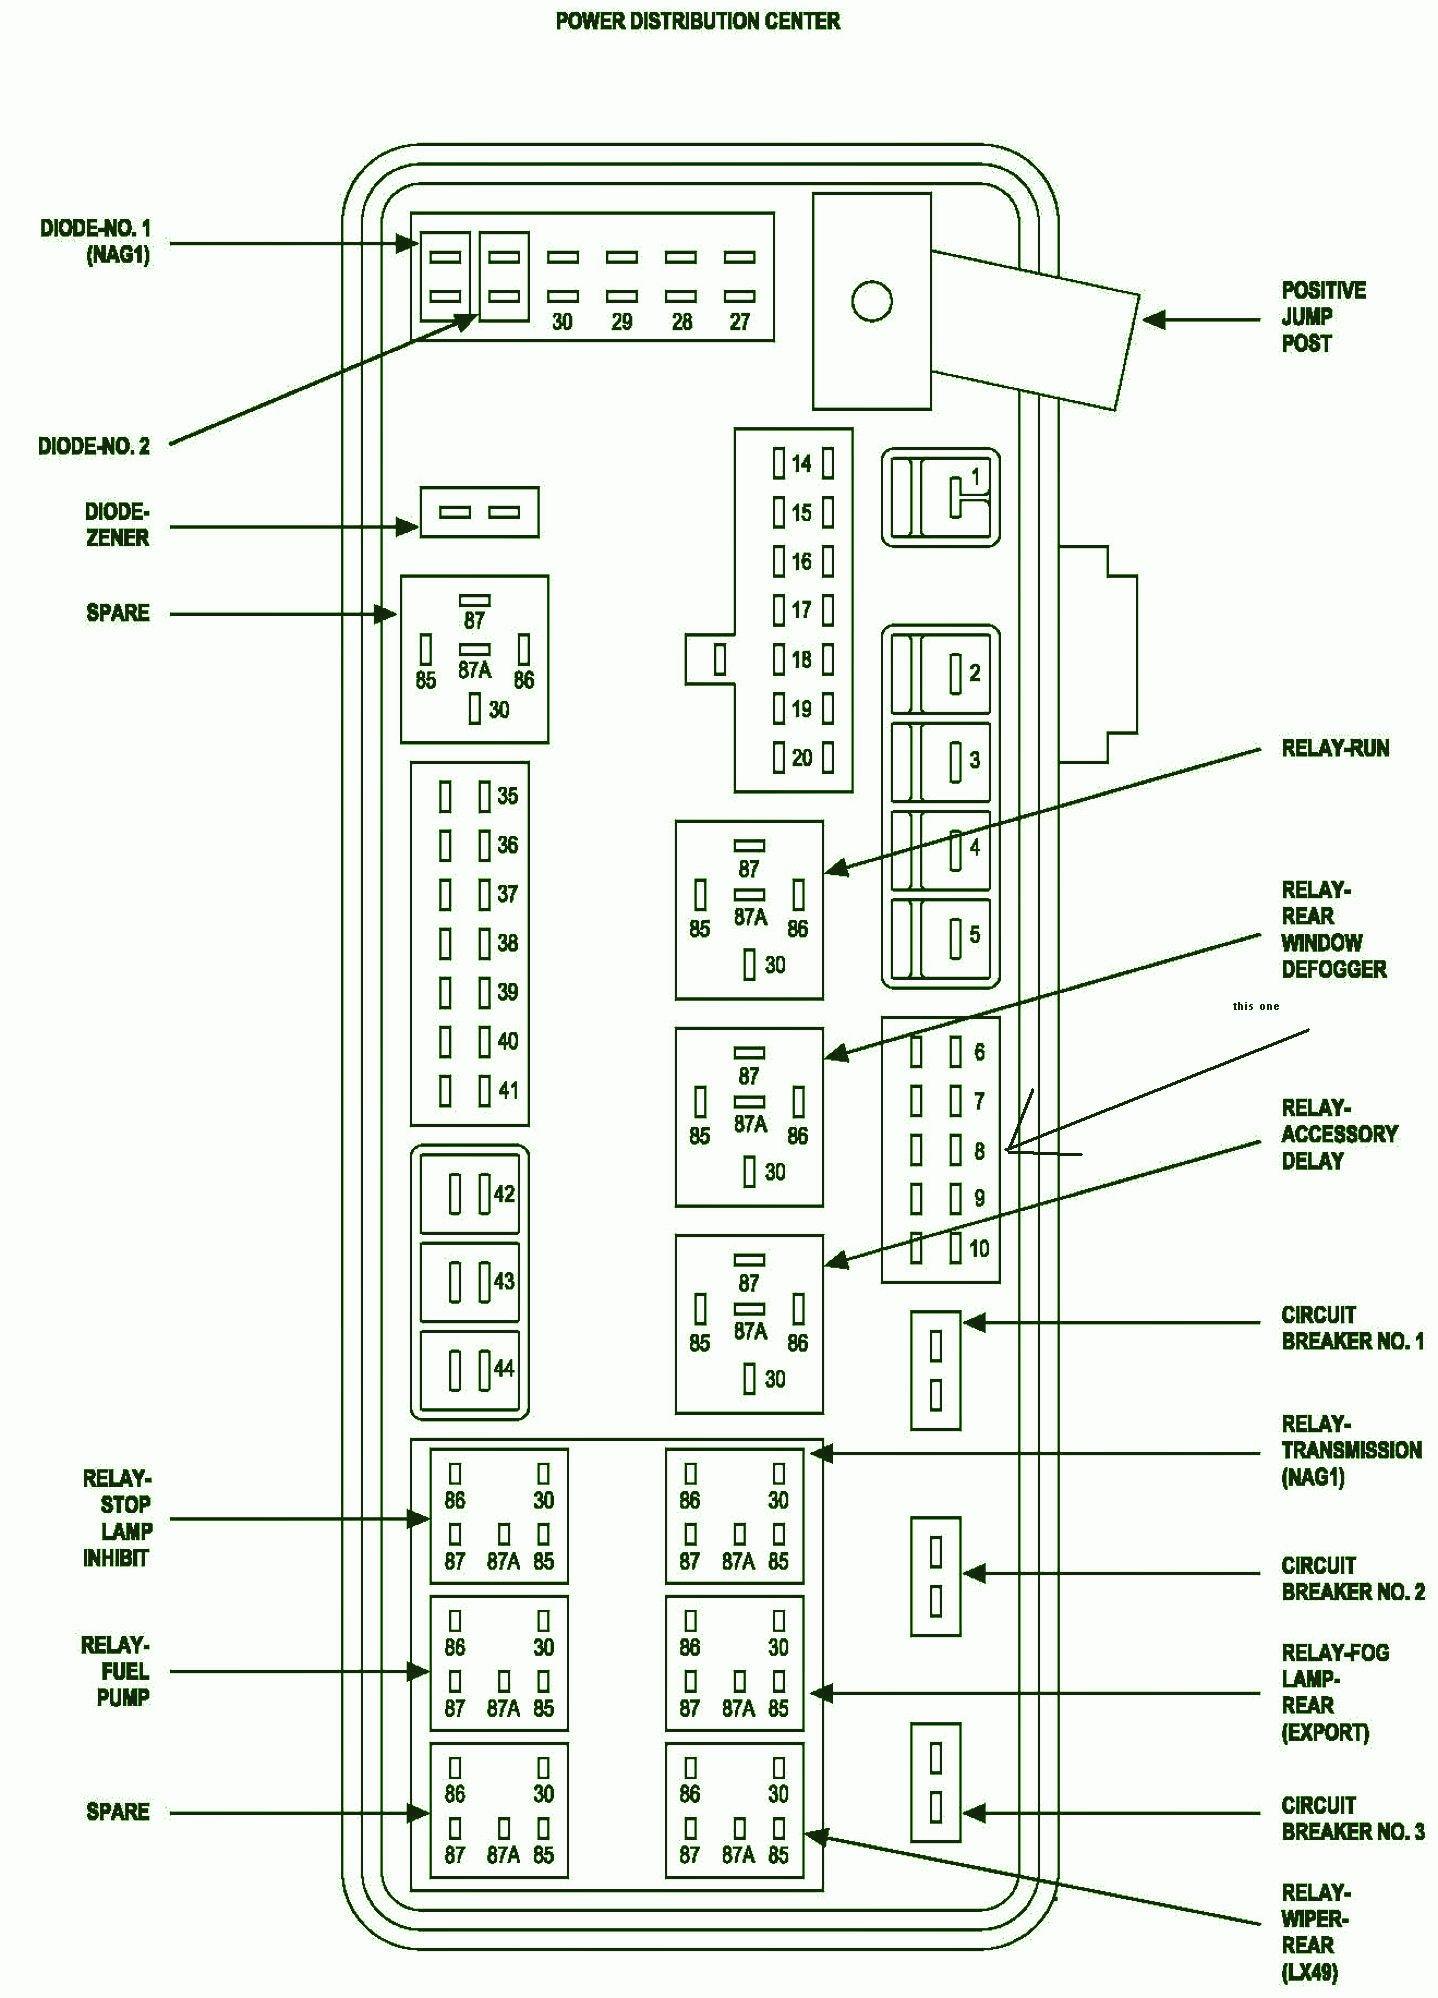 2007 chrysler aspen fuse diagram lenco trim tab switch wiring panel location